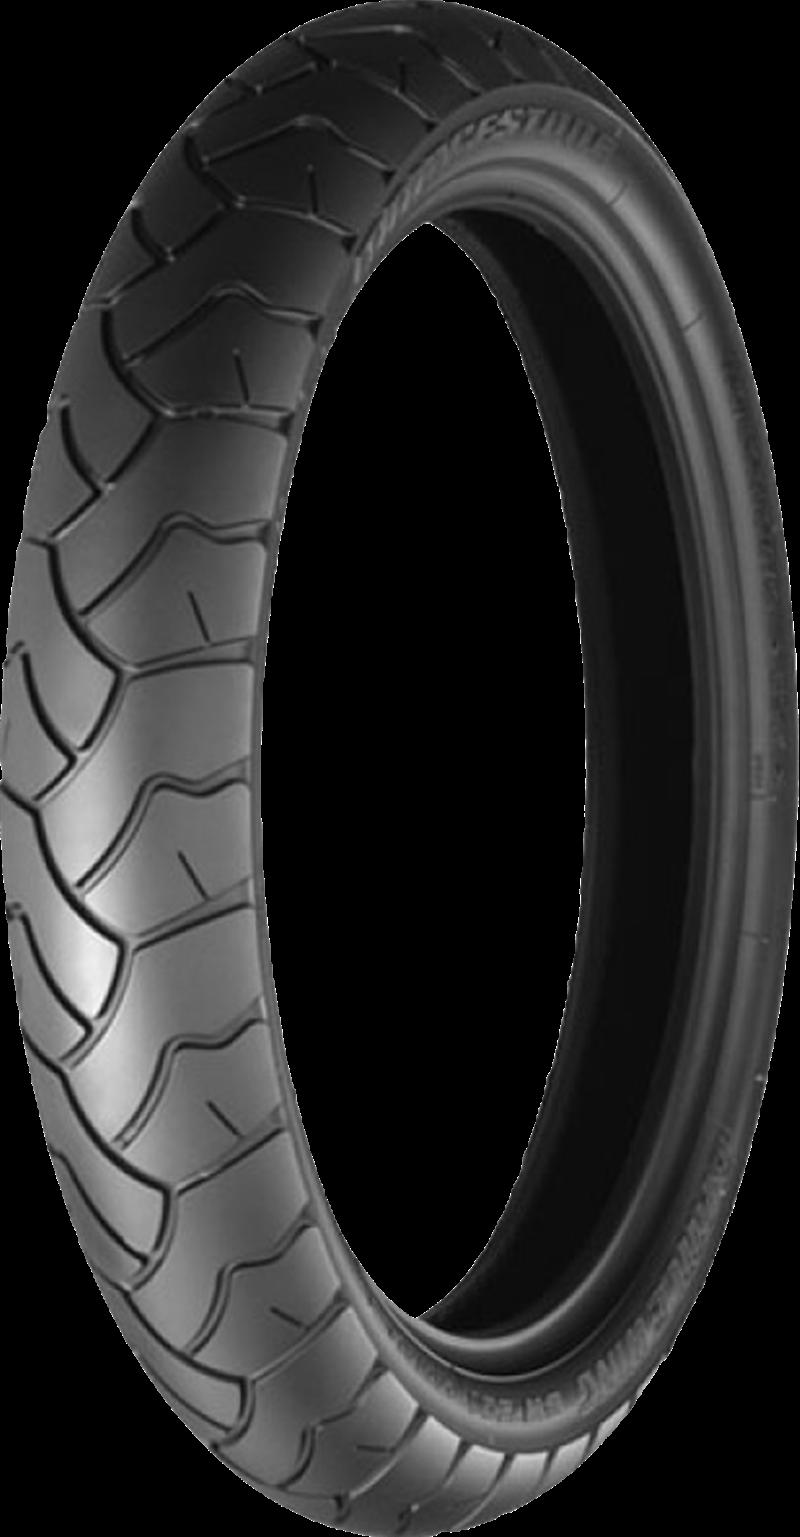 Bridgestone Battle Wing 501 pneu